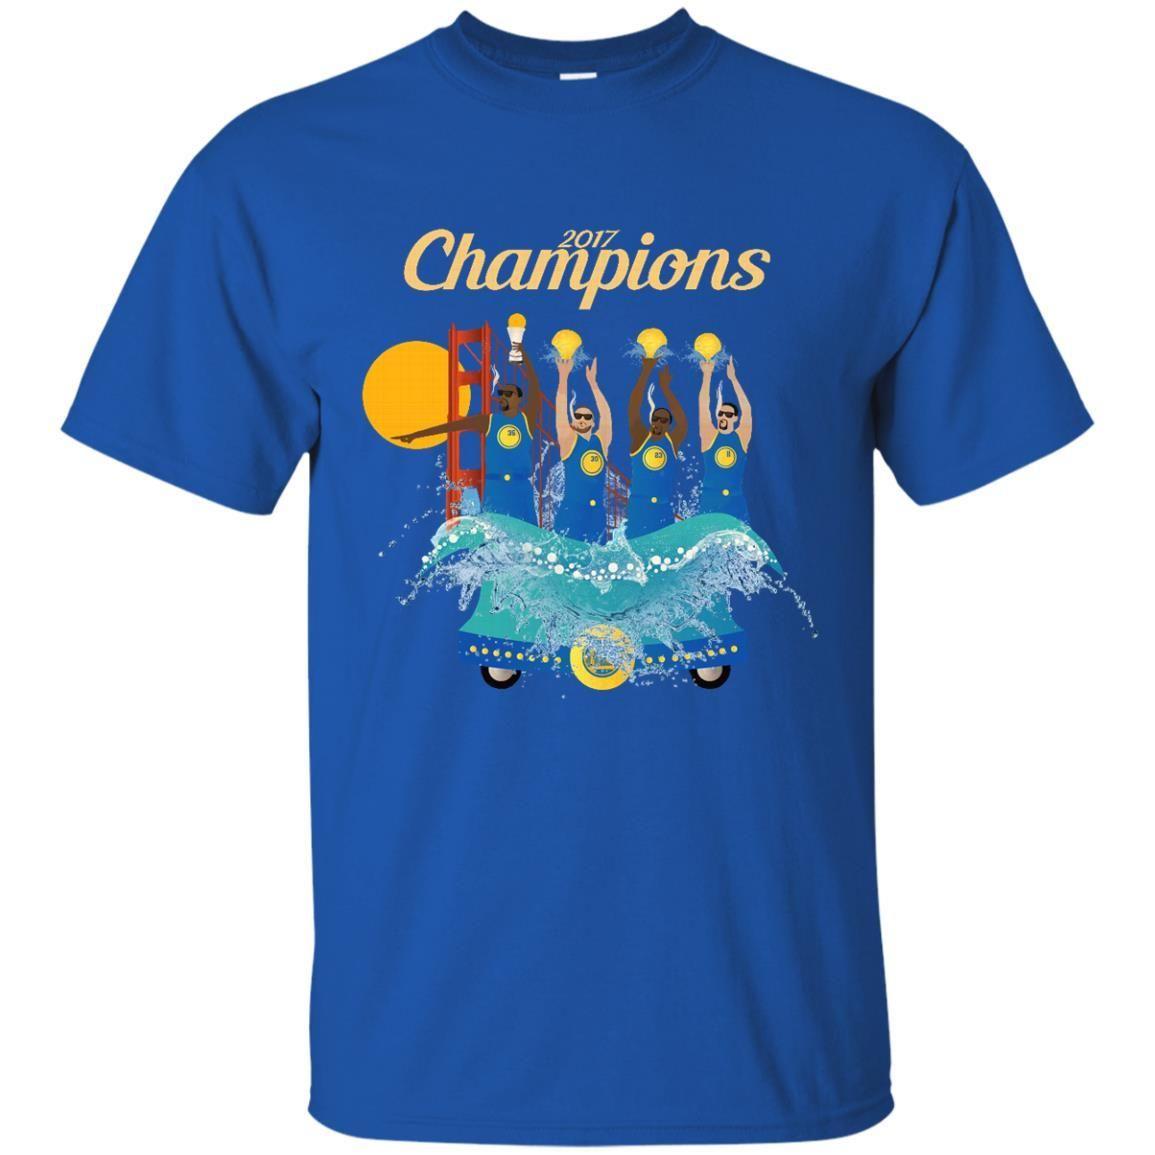 Golden State Warriors T shirts NBA Champions 2017 Hoodies Sweatshirts